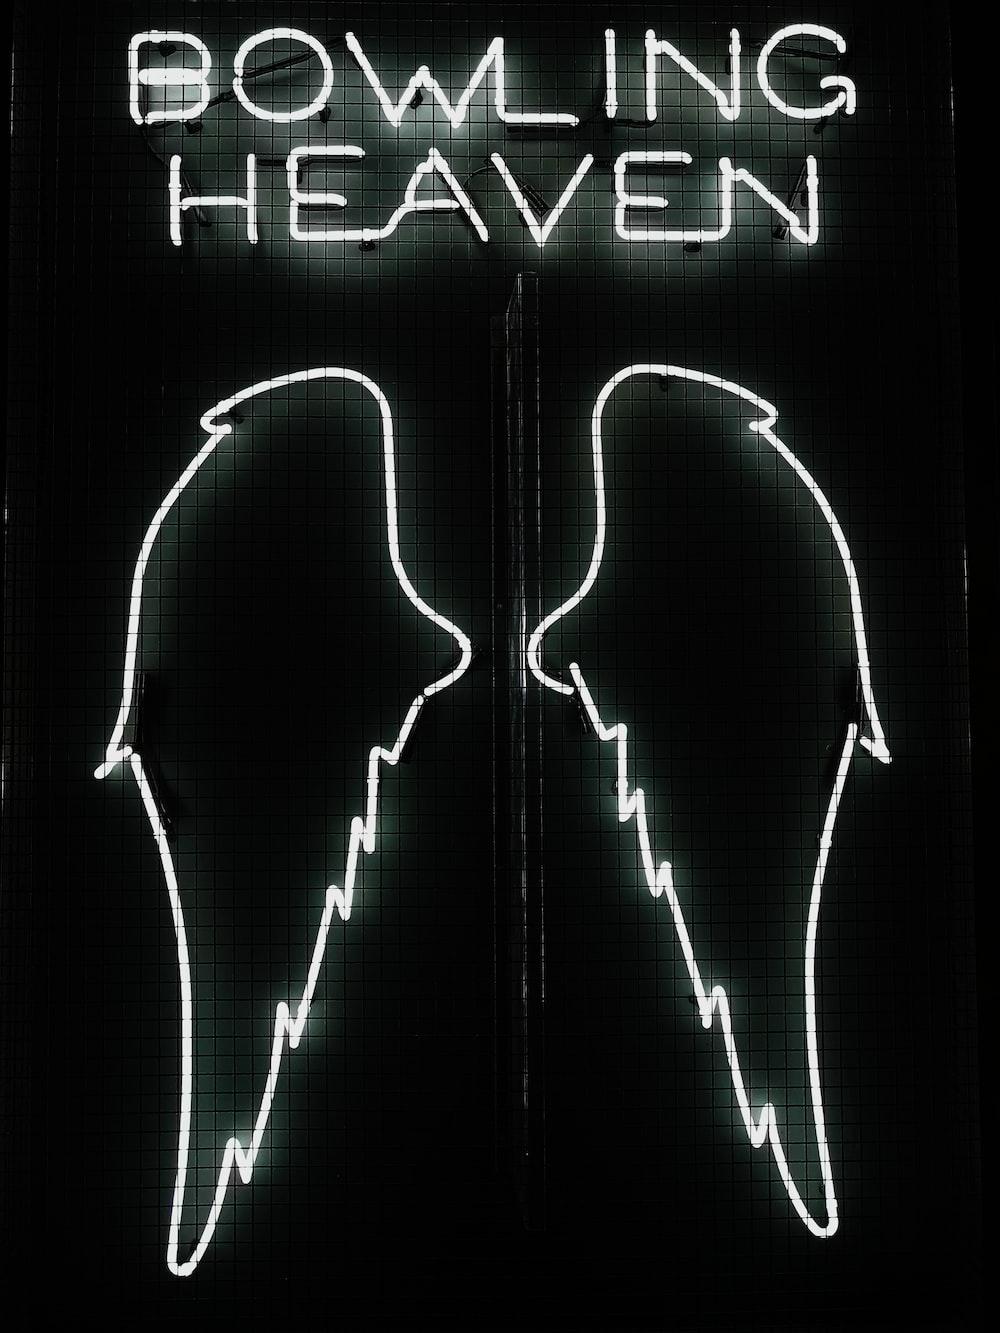 bowling heaven LED light